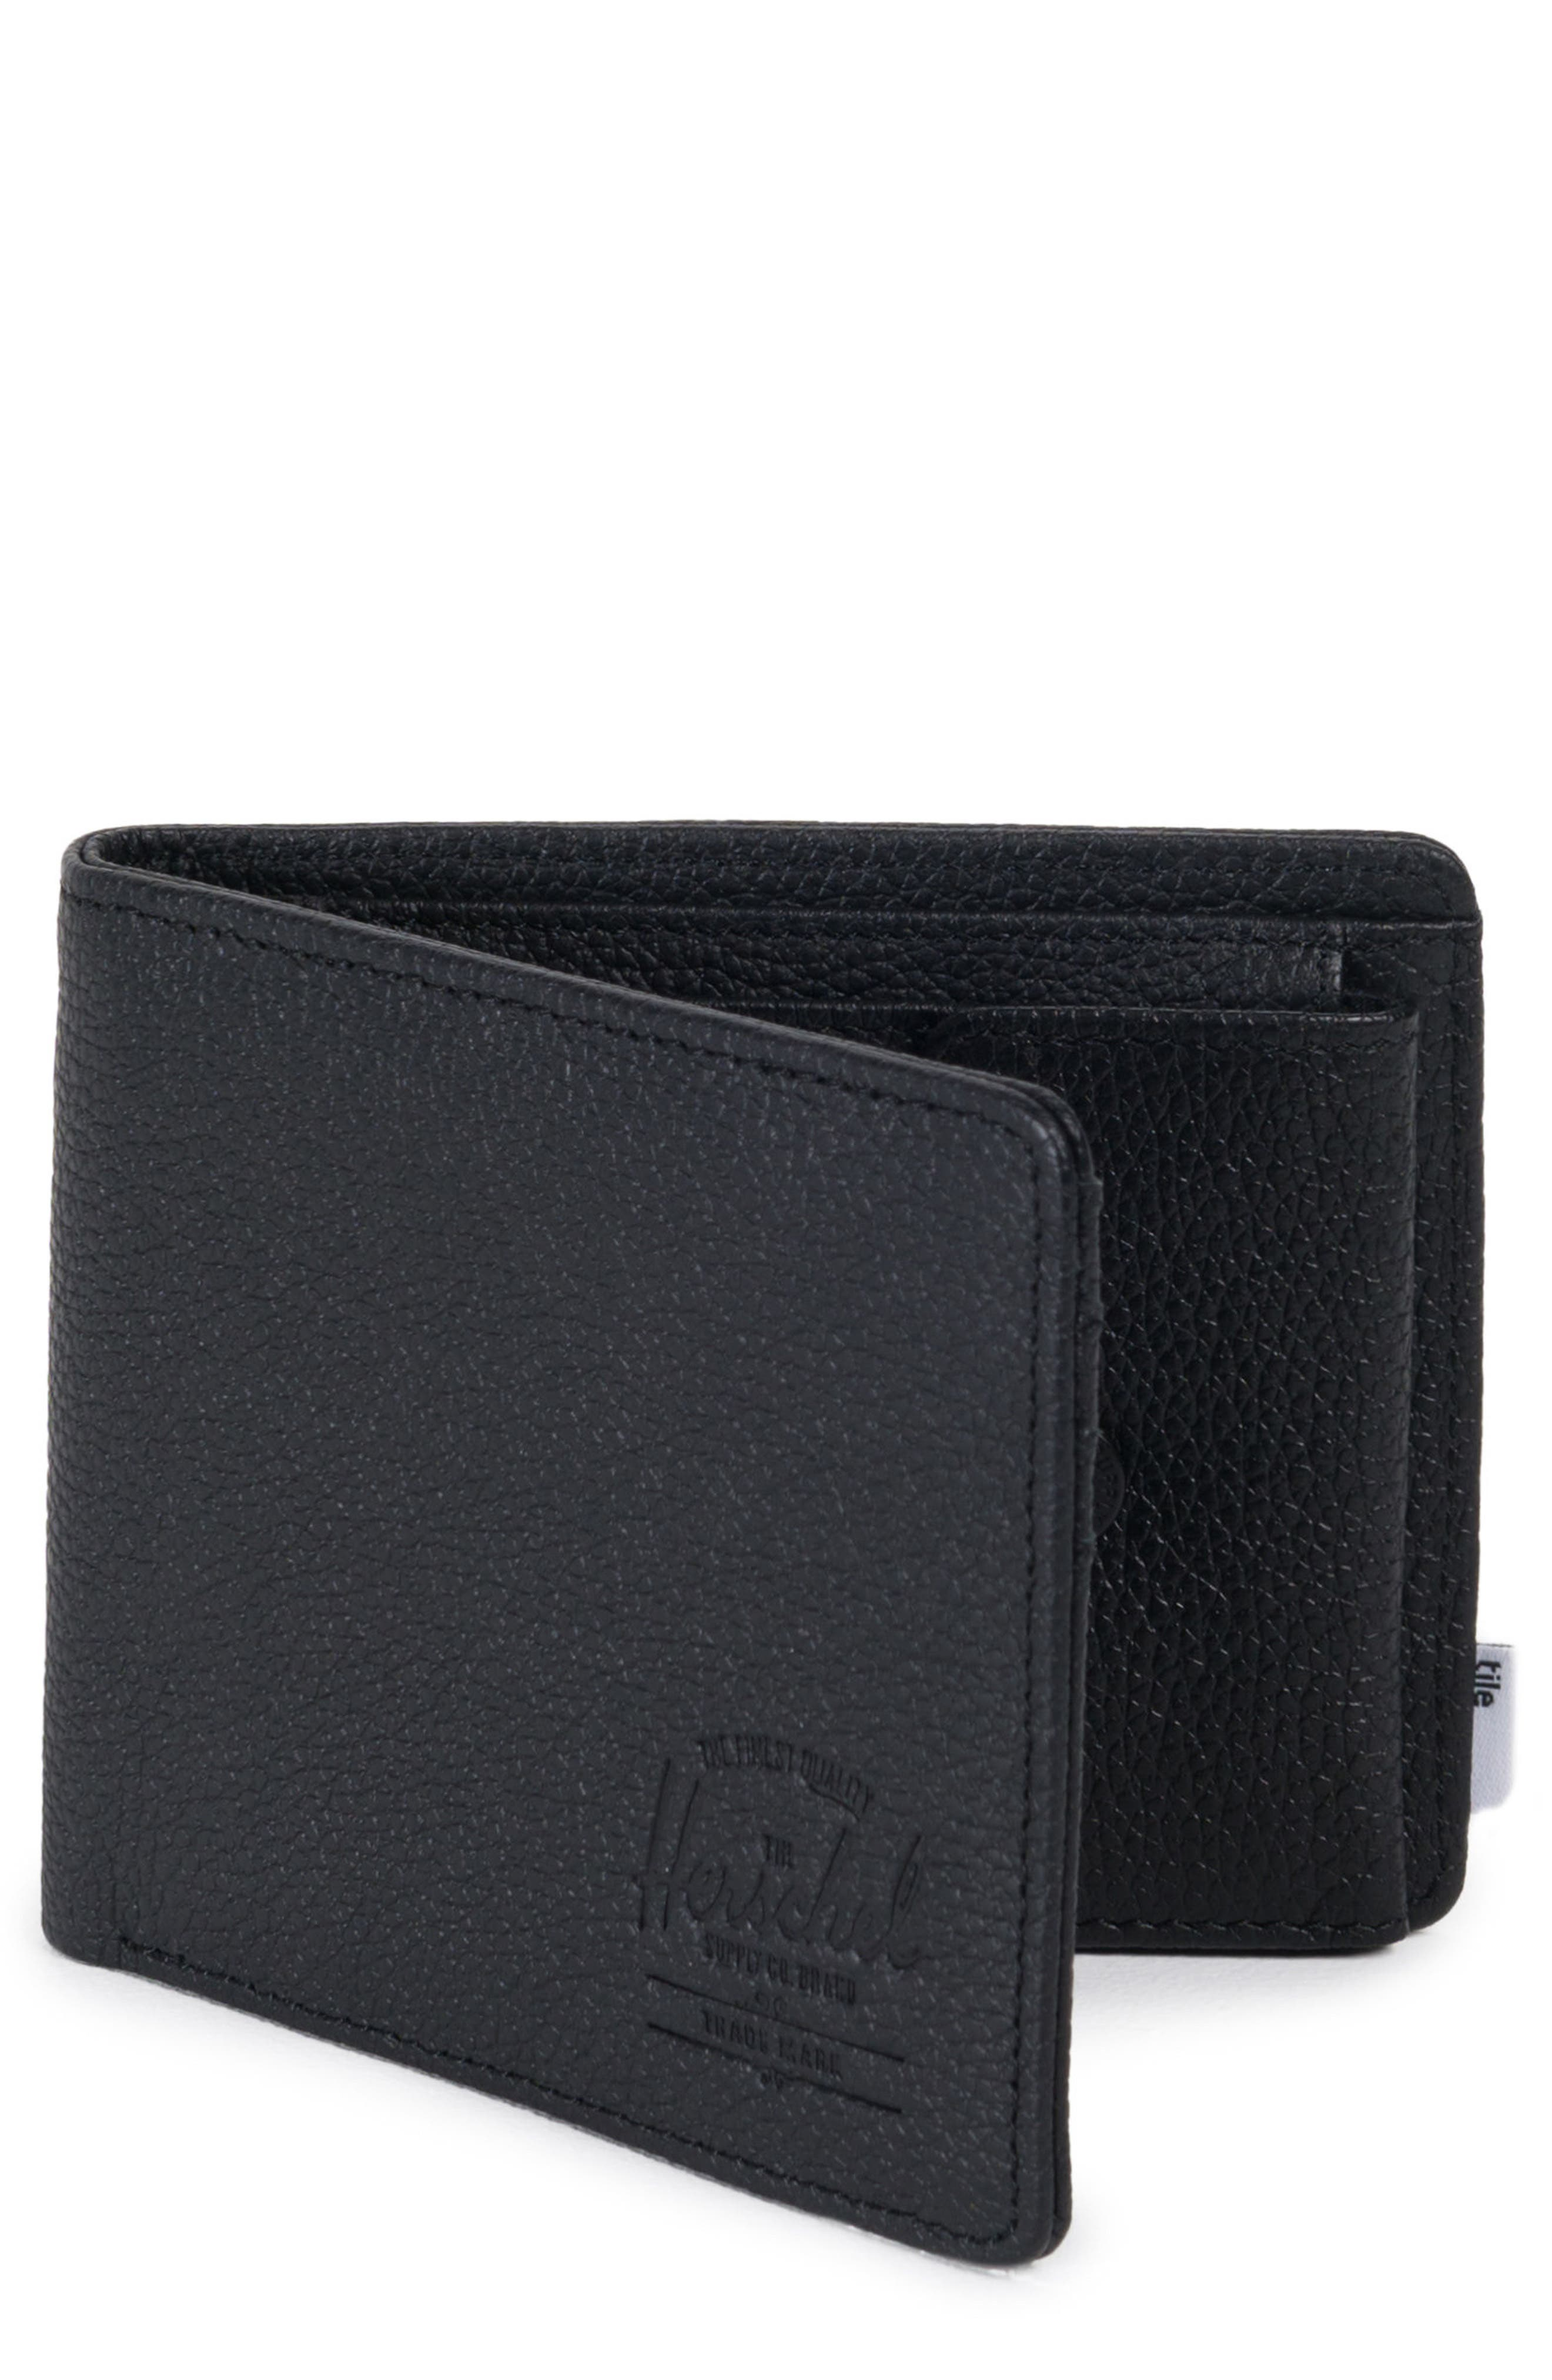 Tile Roy Leather Wallet,                         Main,                         color, 001